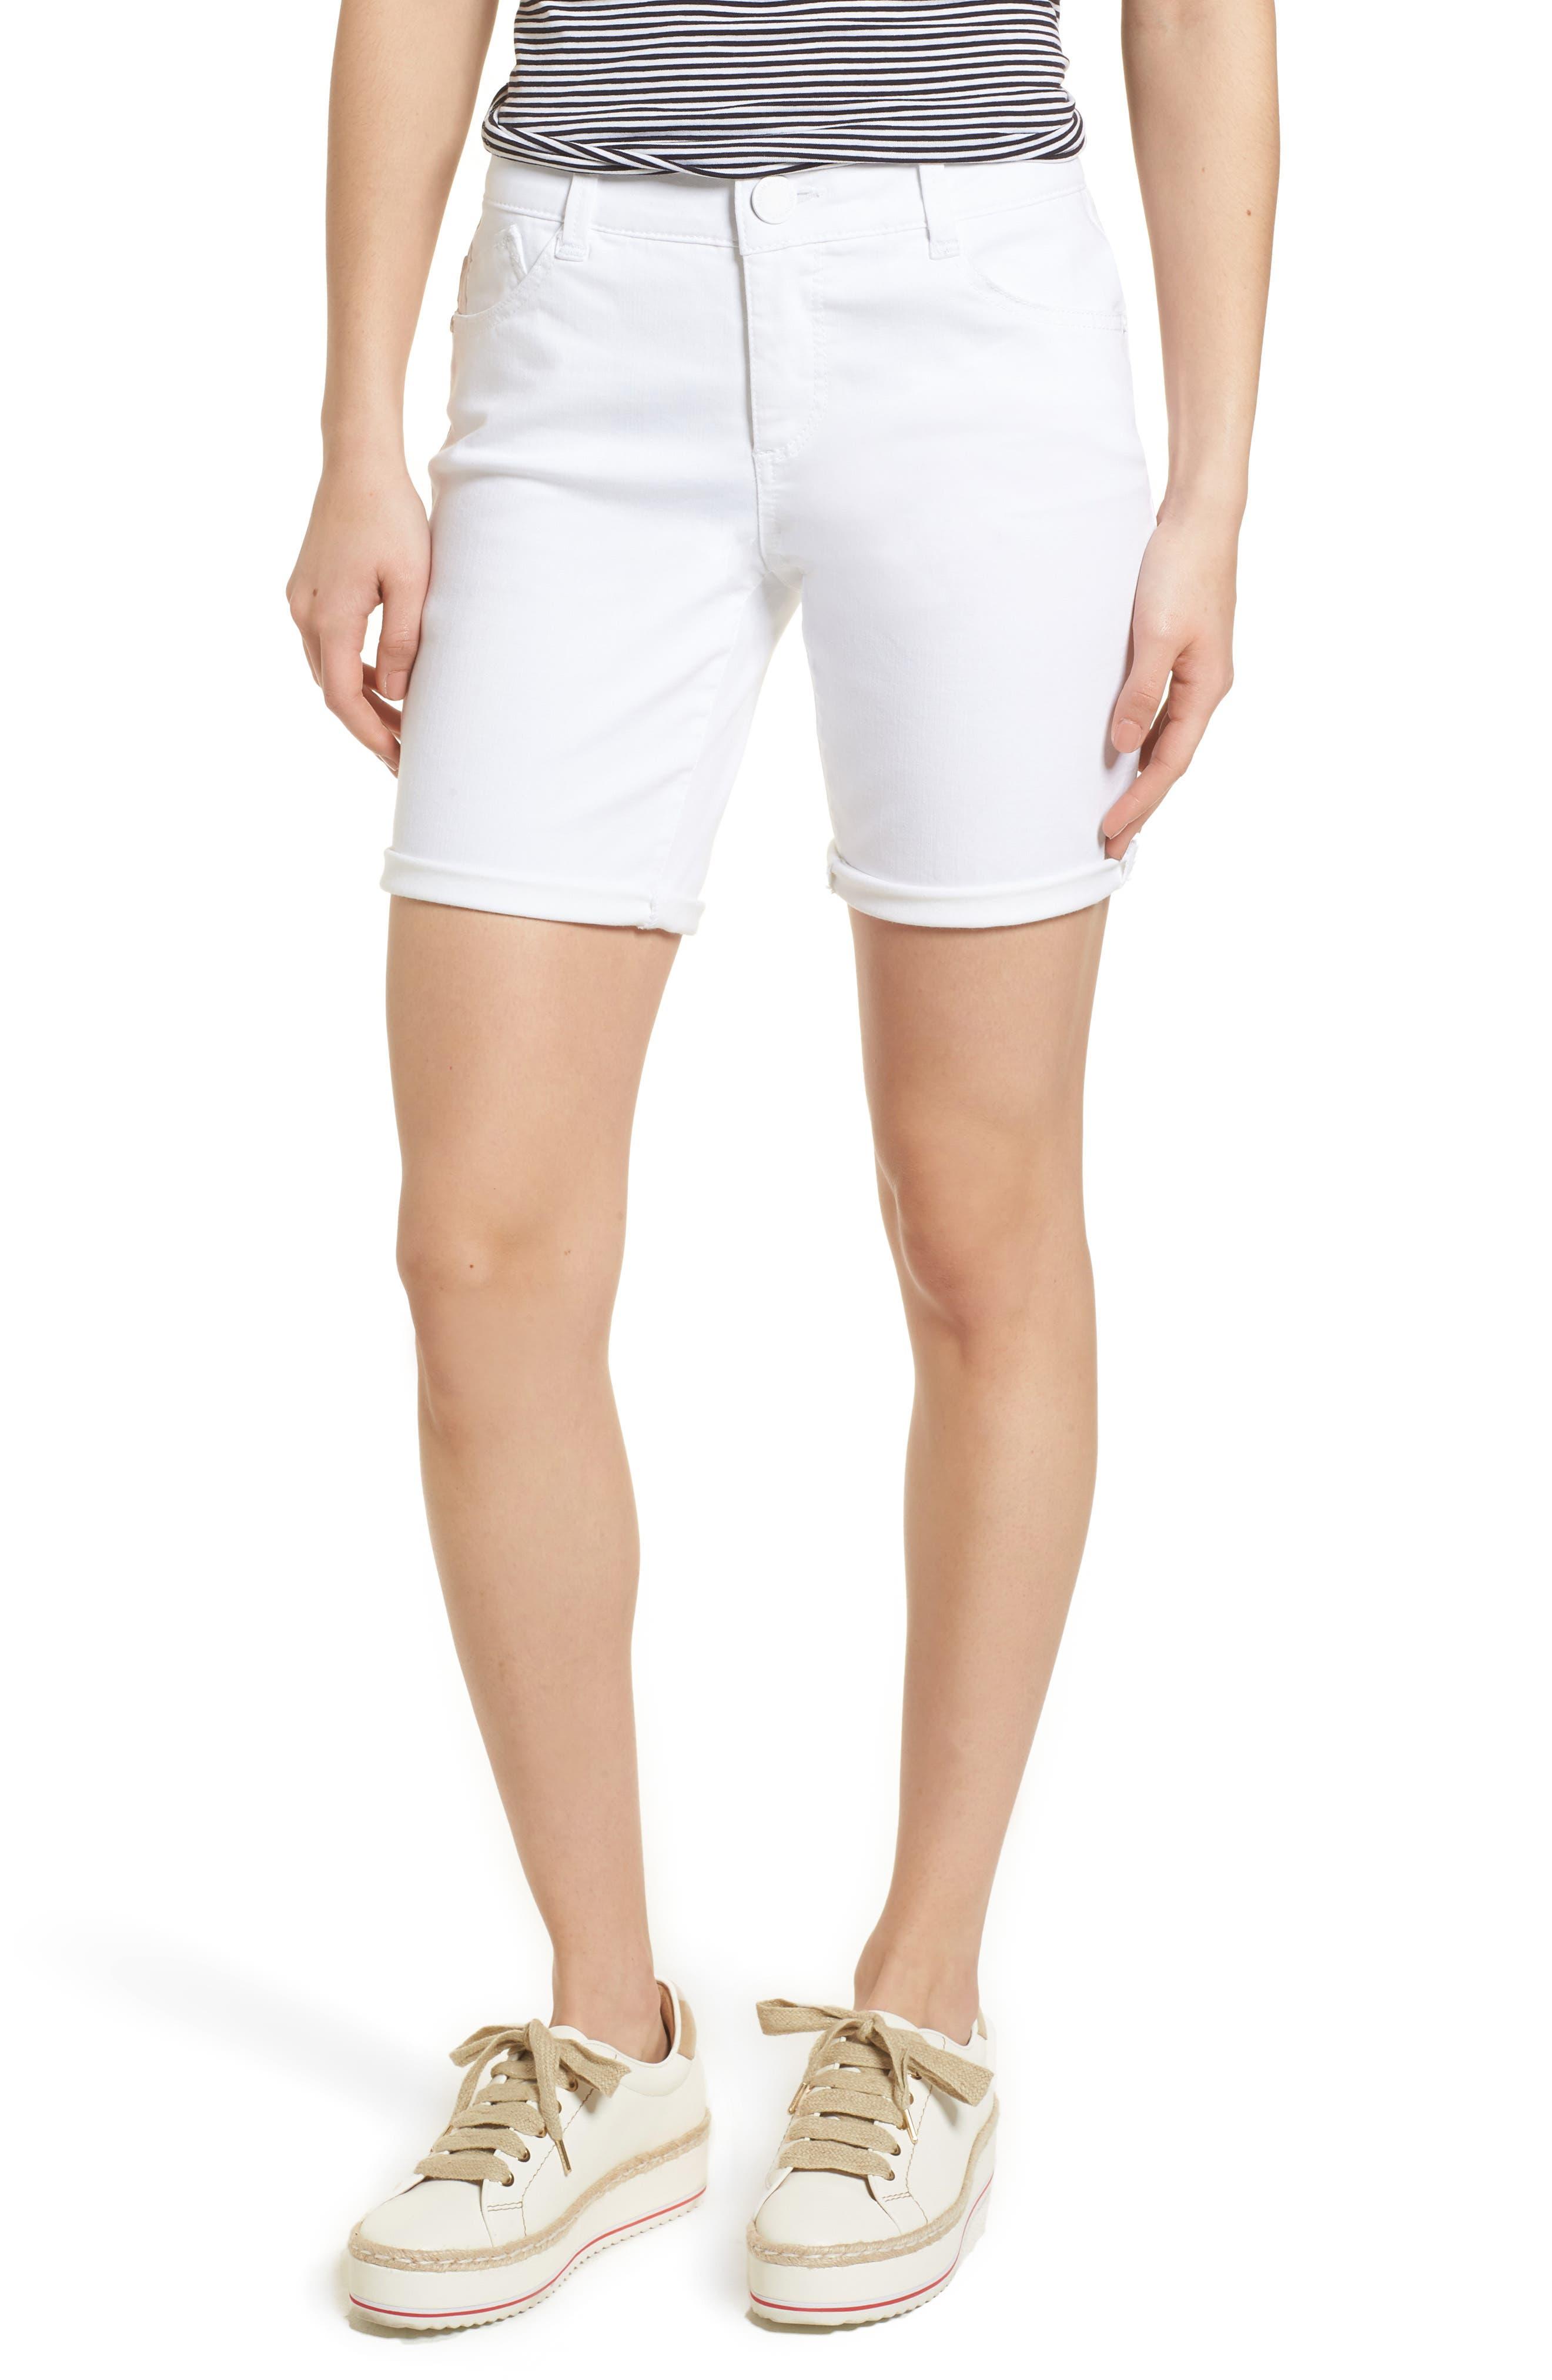 Ab-Solution White Denim Shorts,                             Main thumbnail 1, color,                             Optic White